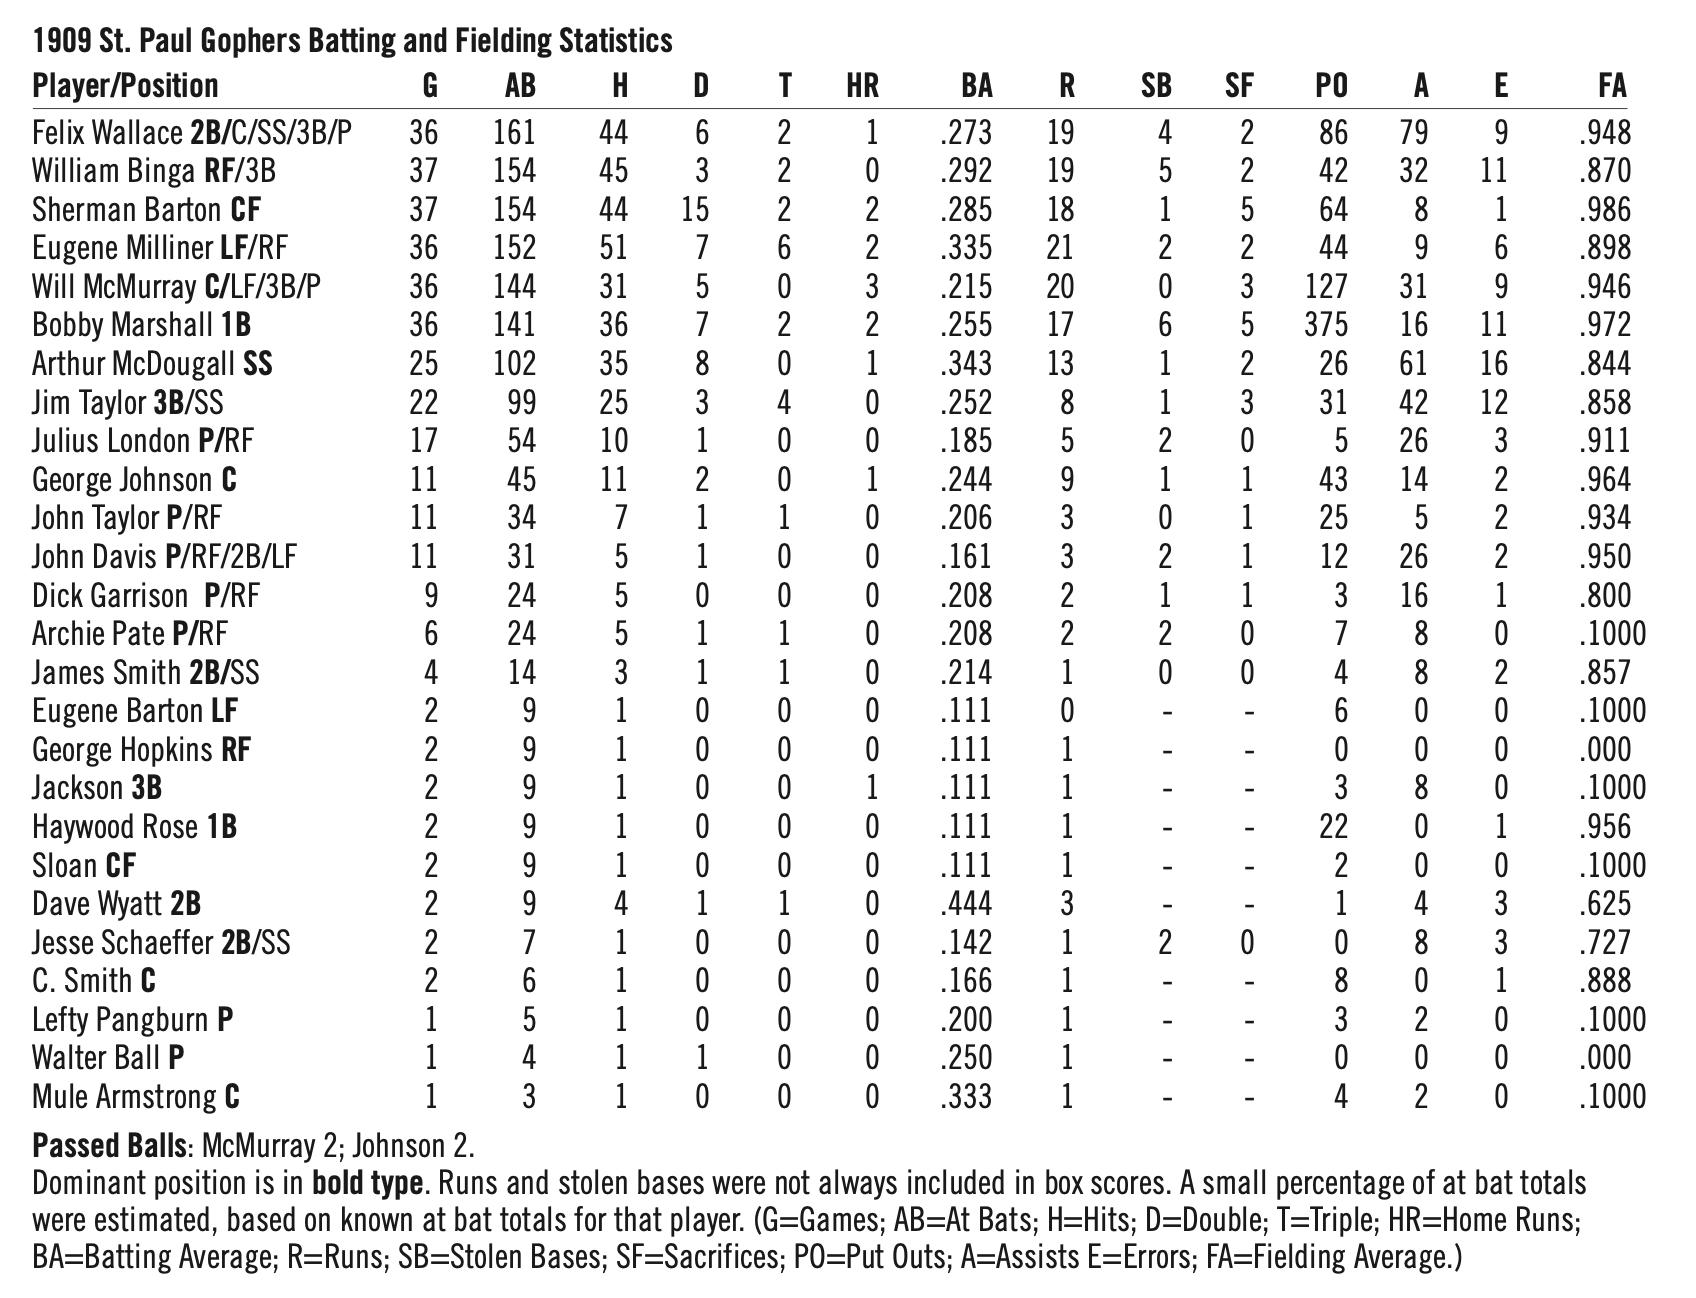 1909 St. Paul Gophers hitting stats